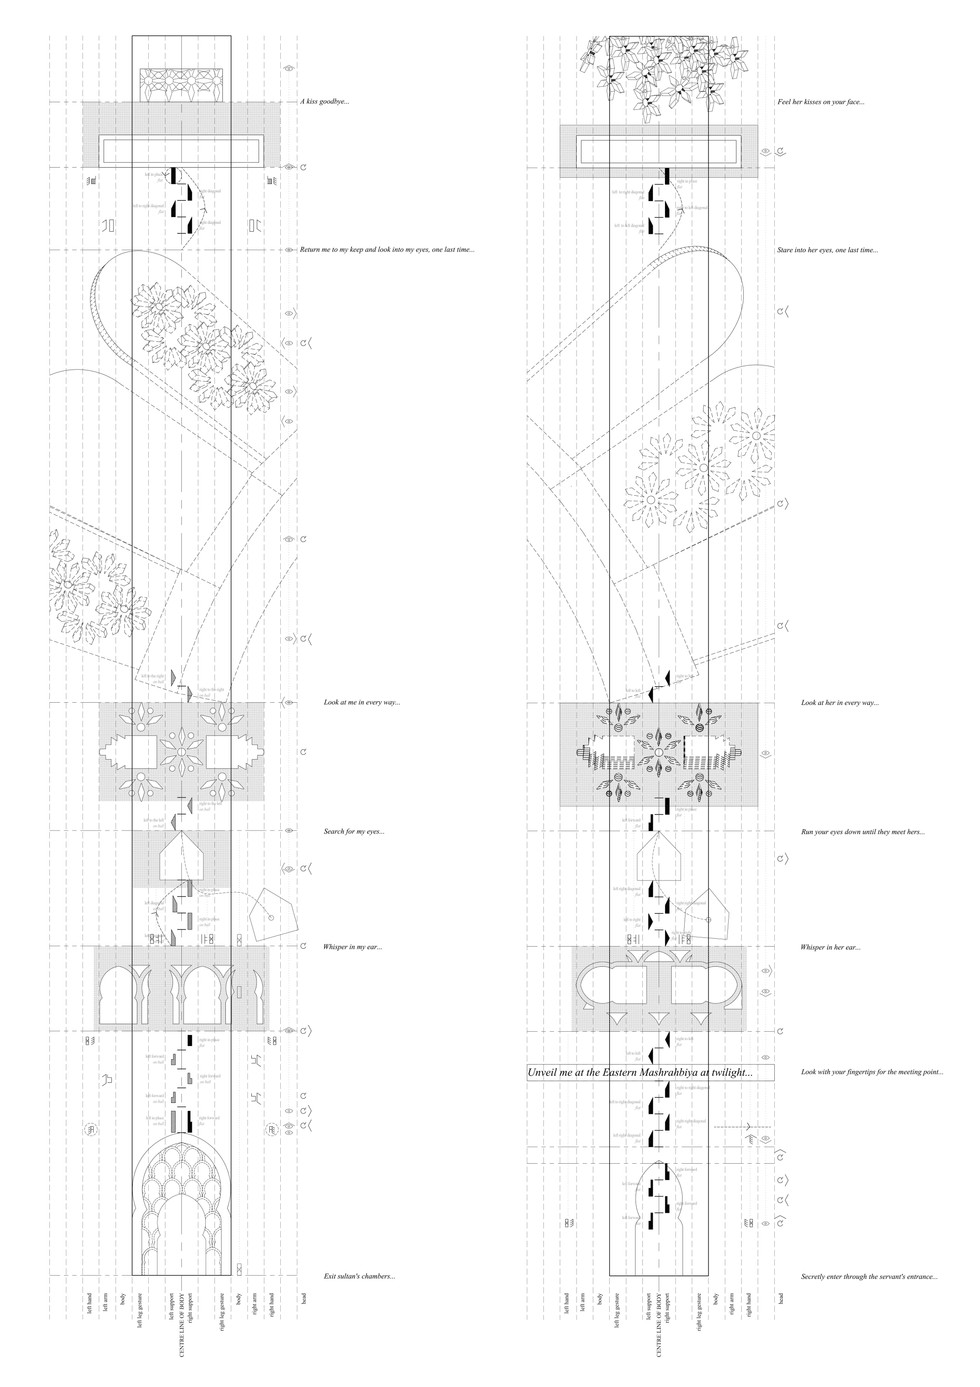 Arcade of notation. Lu, H. Unit 12. 2019